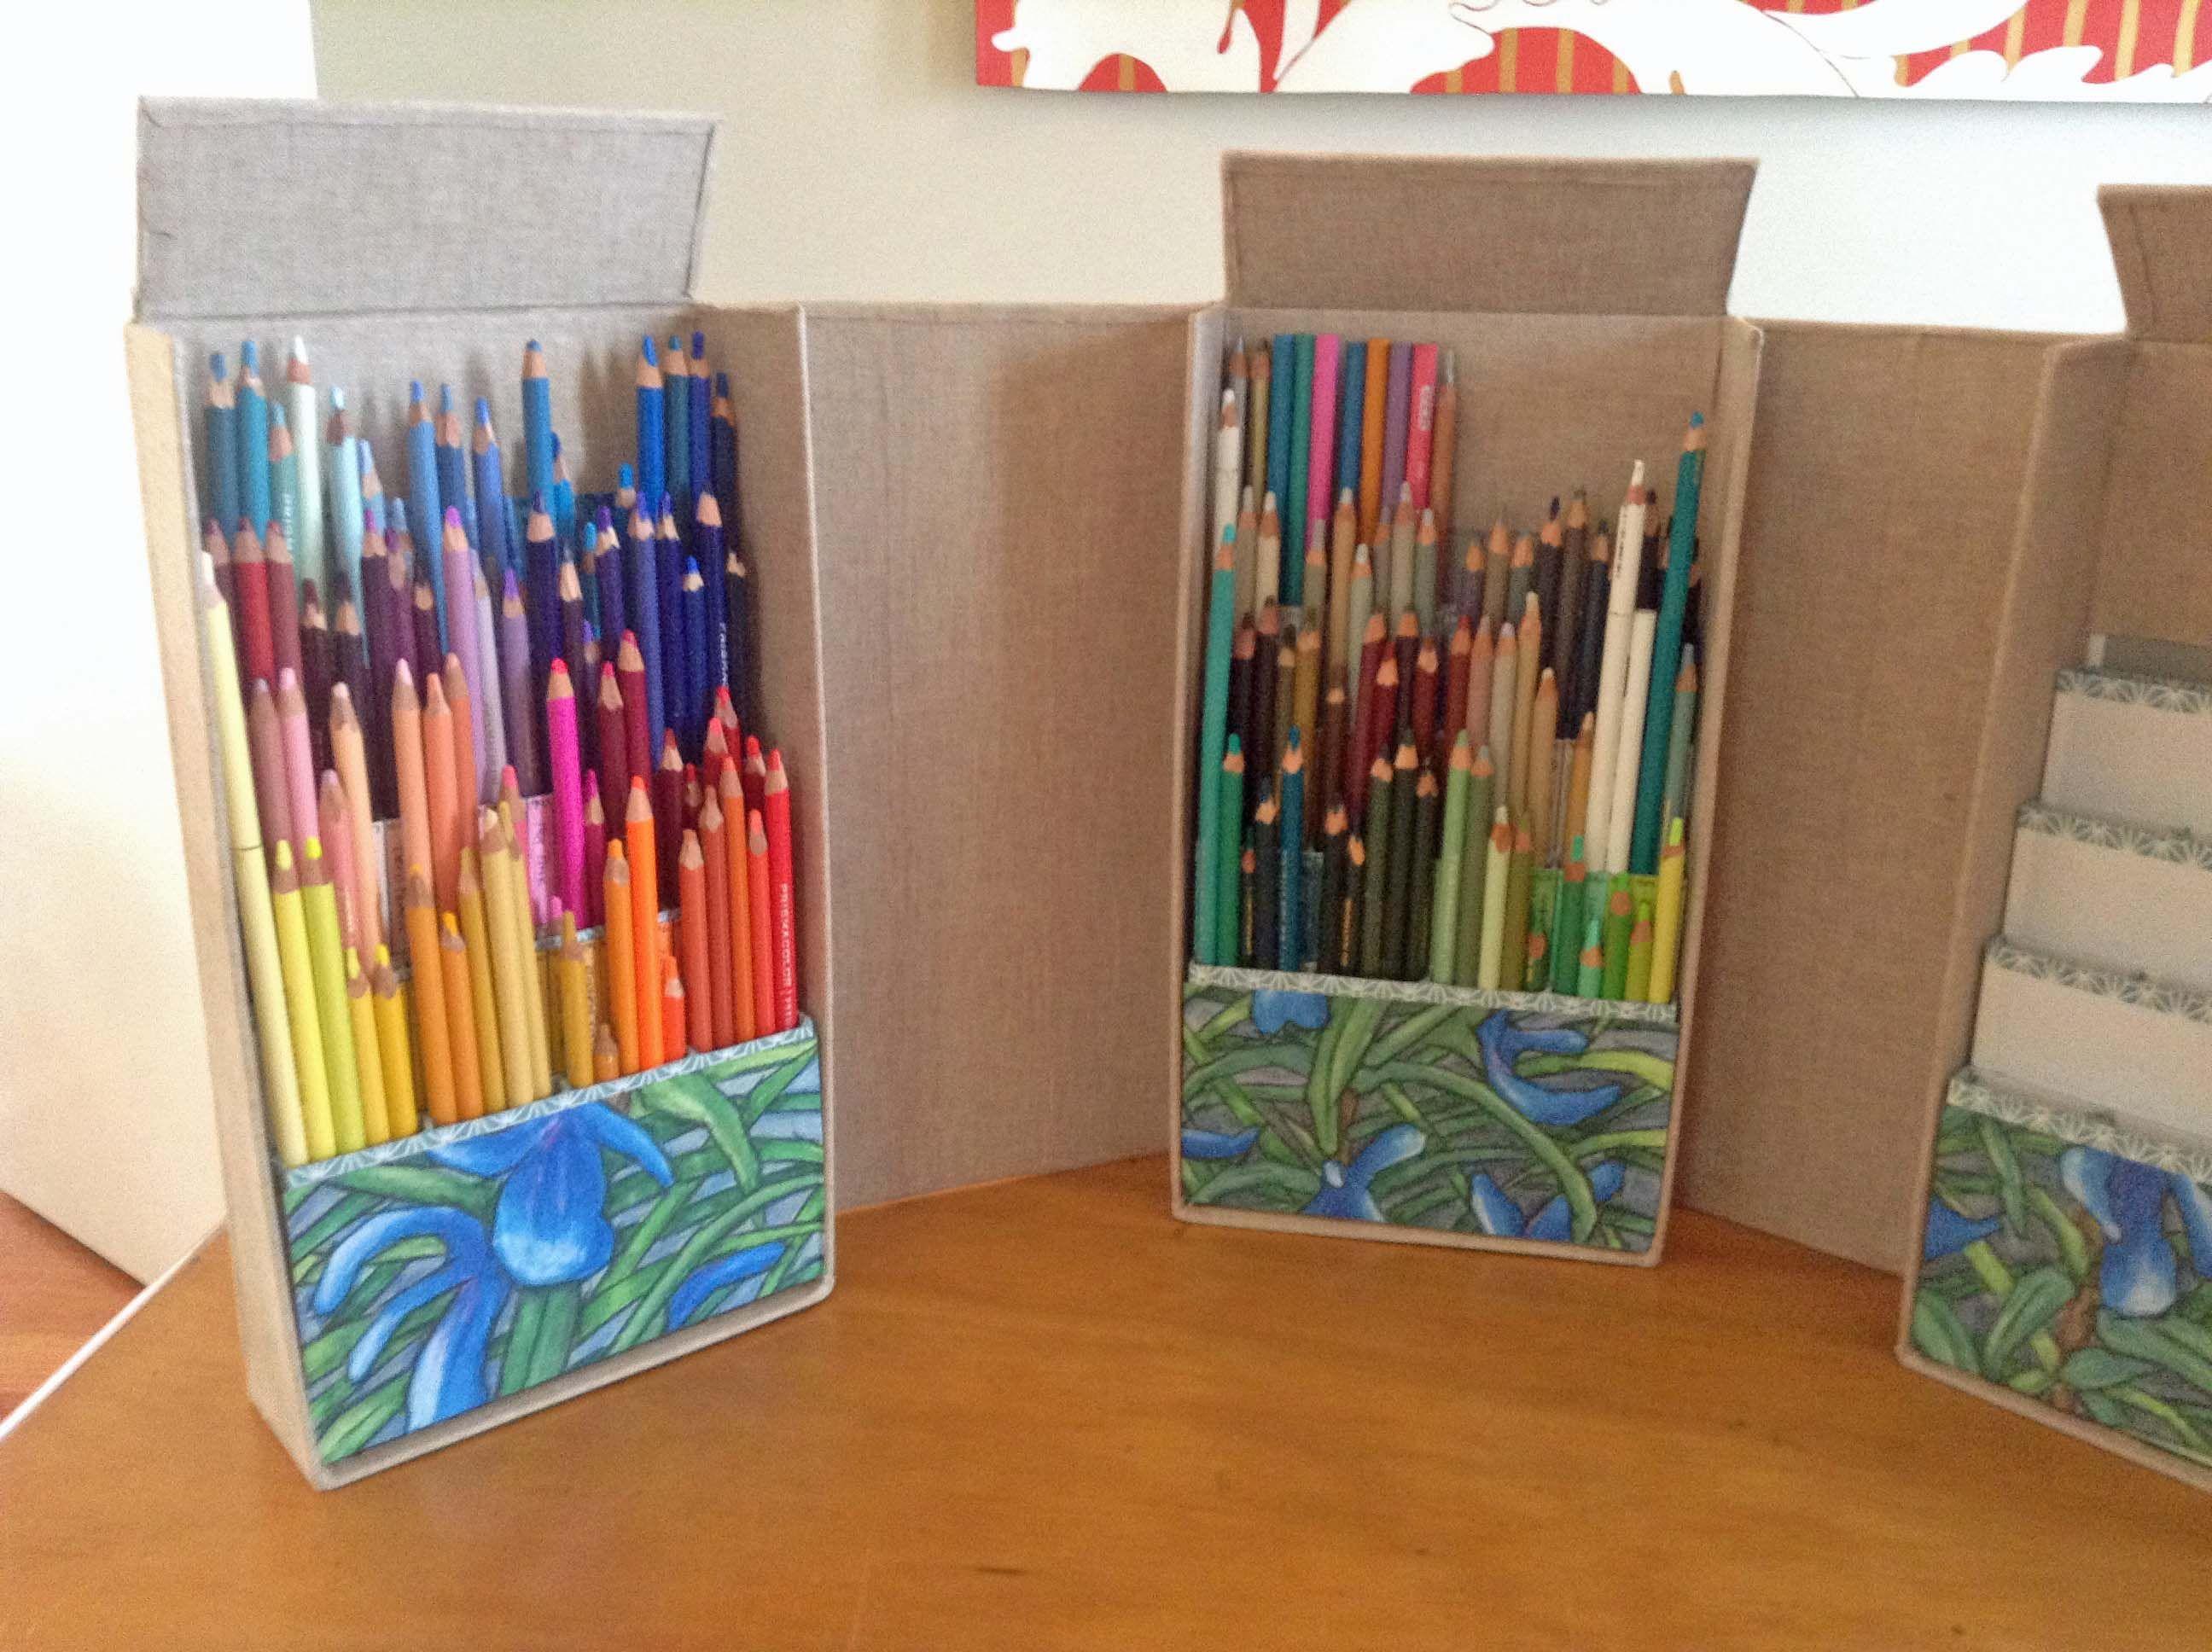 Arts and craft box - Art Supplies New Pencil Box Just Waiting For More Pencils